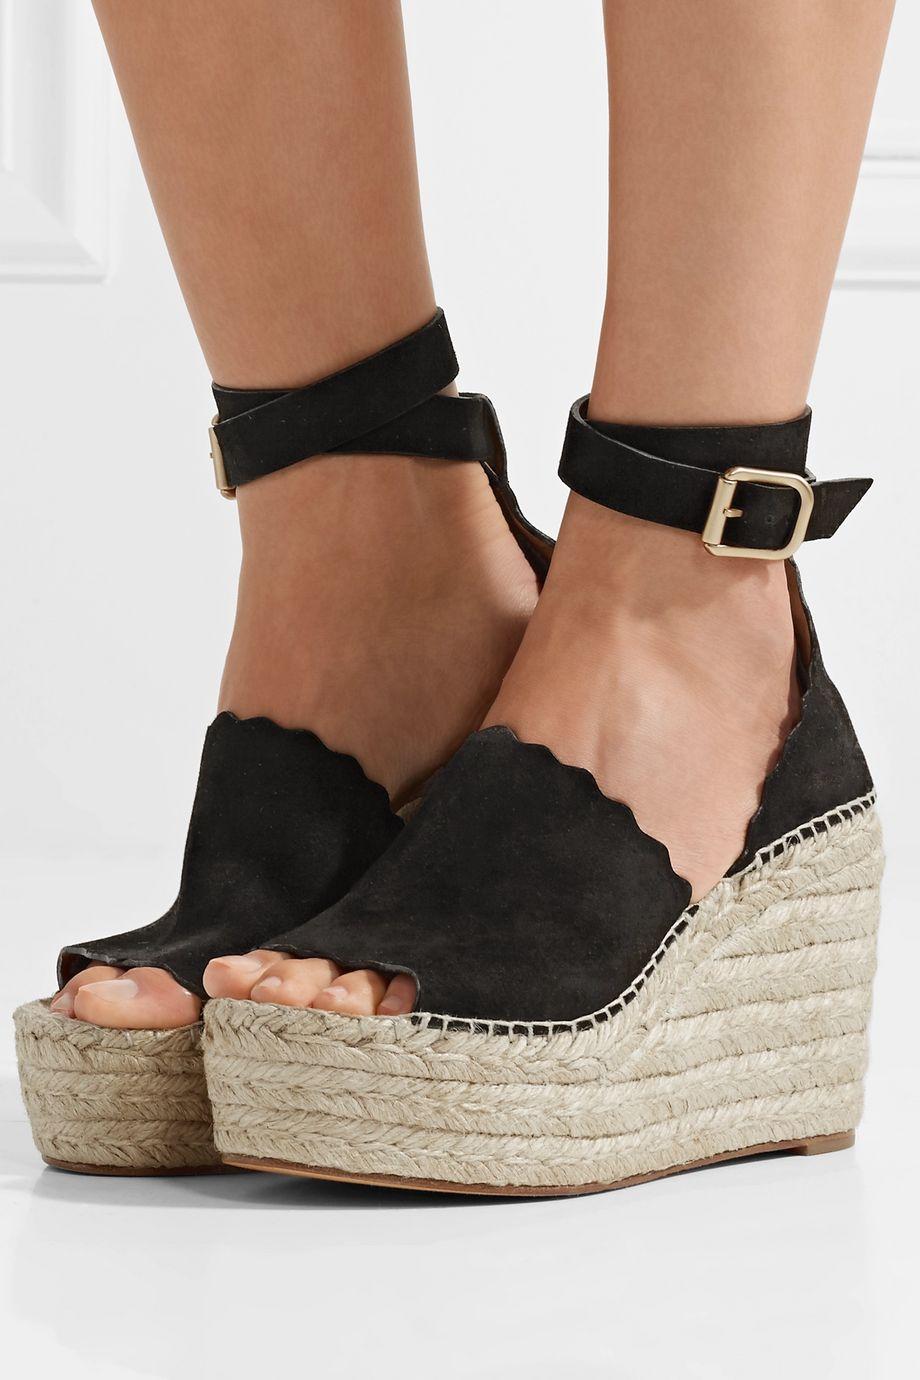 Chloé Lauren 绒面革坡跟麻底鞋